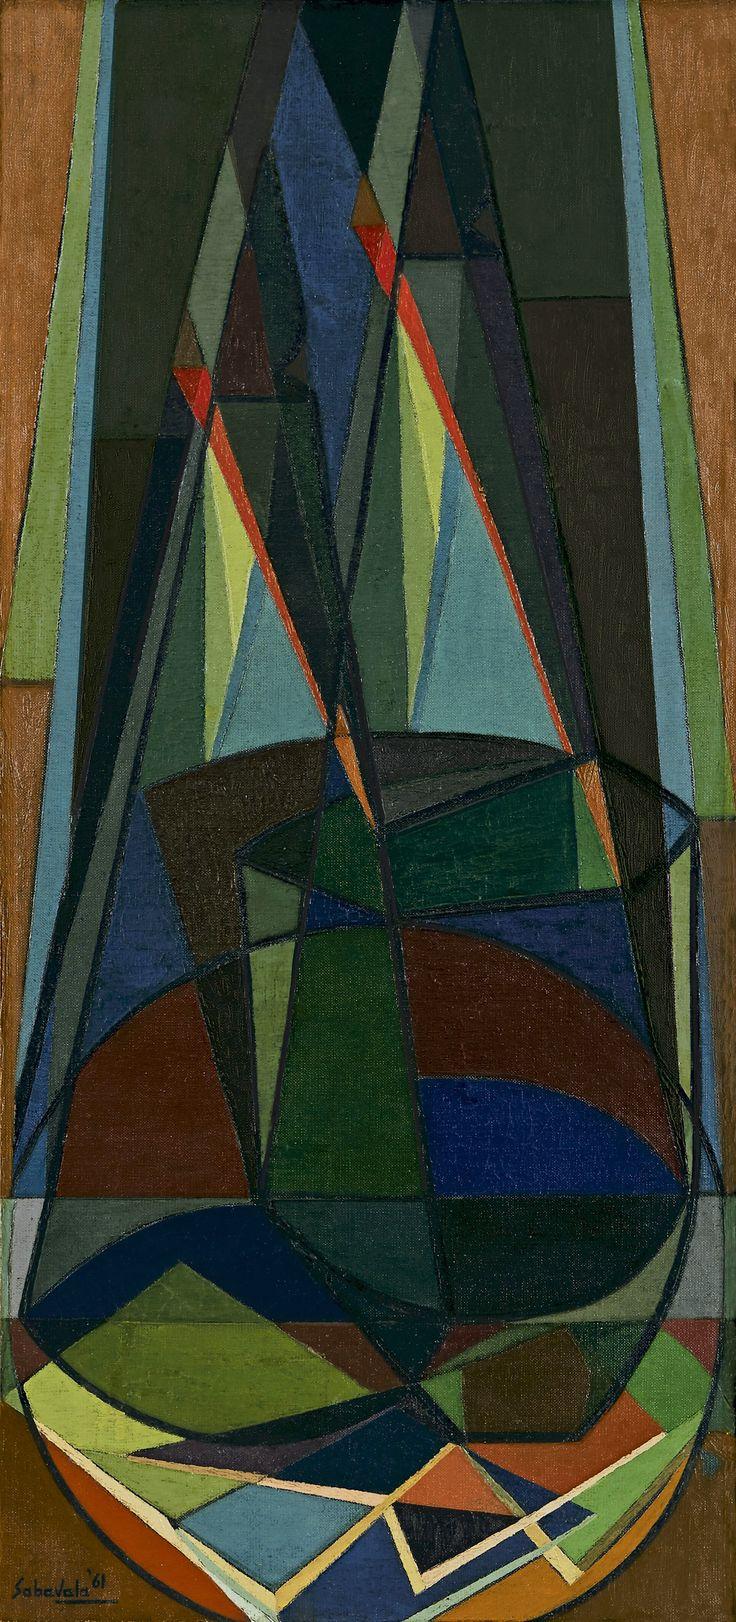 Jehangir Sabavala Medium: Oil on canvas Year: 1961 Size: 42 x 19 in.